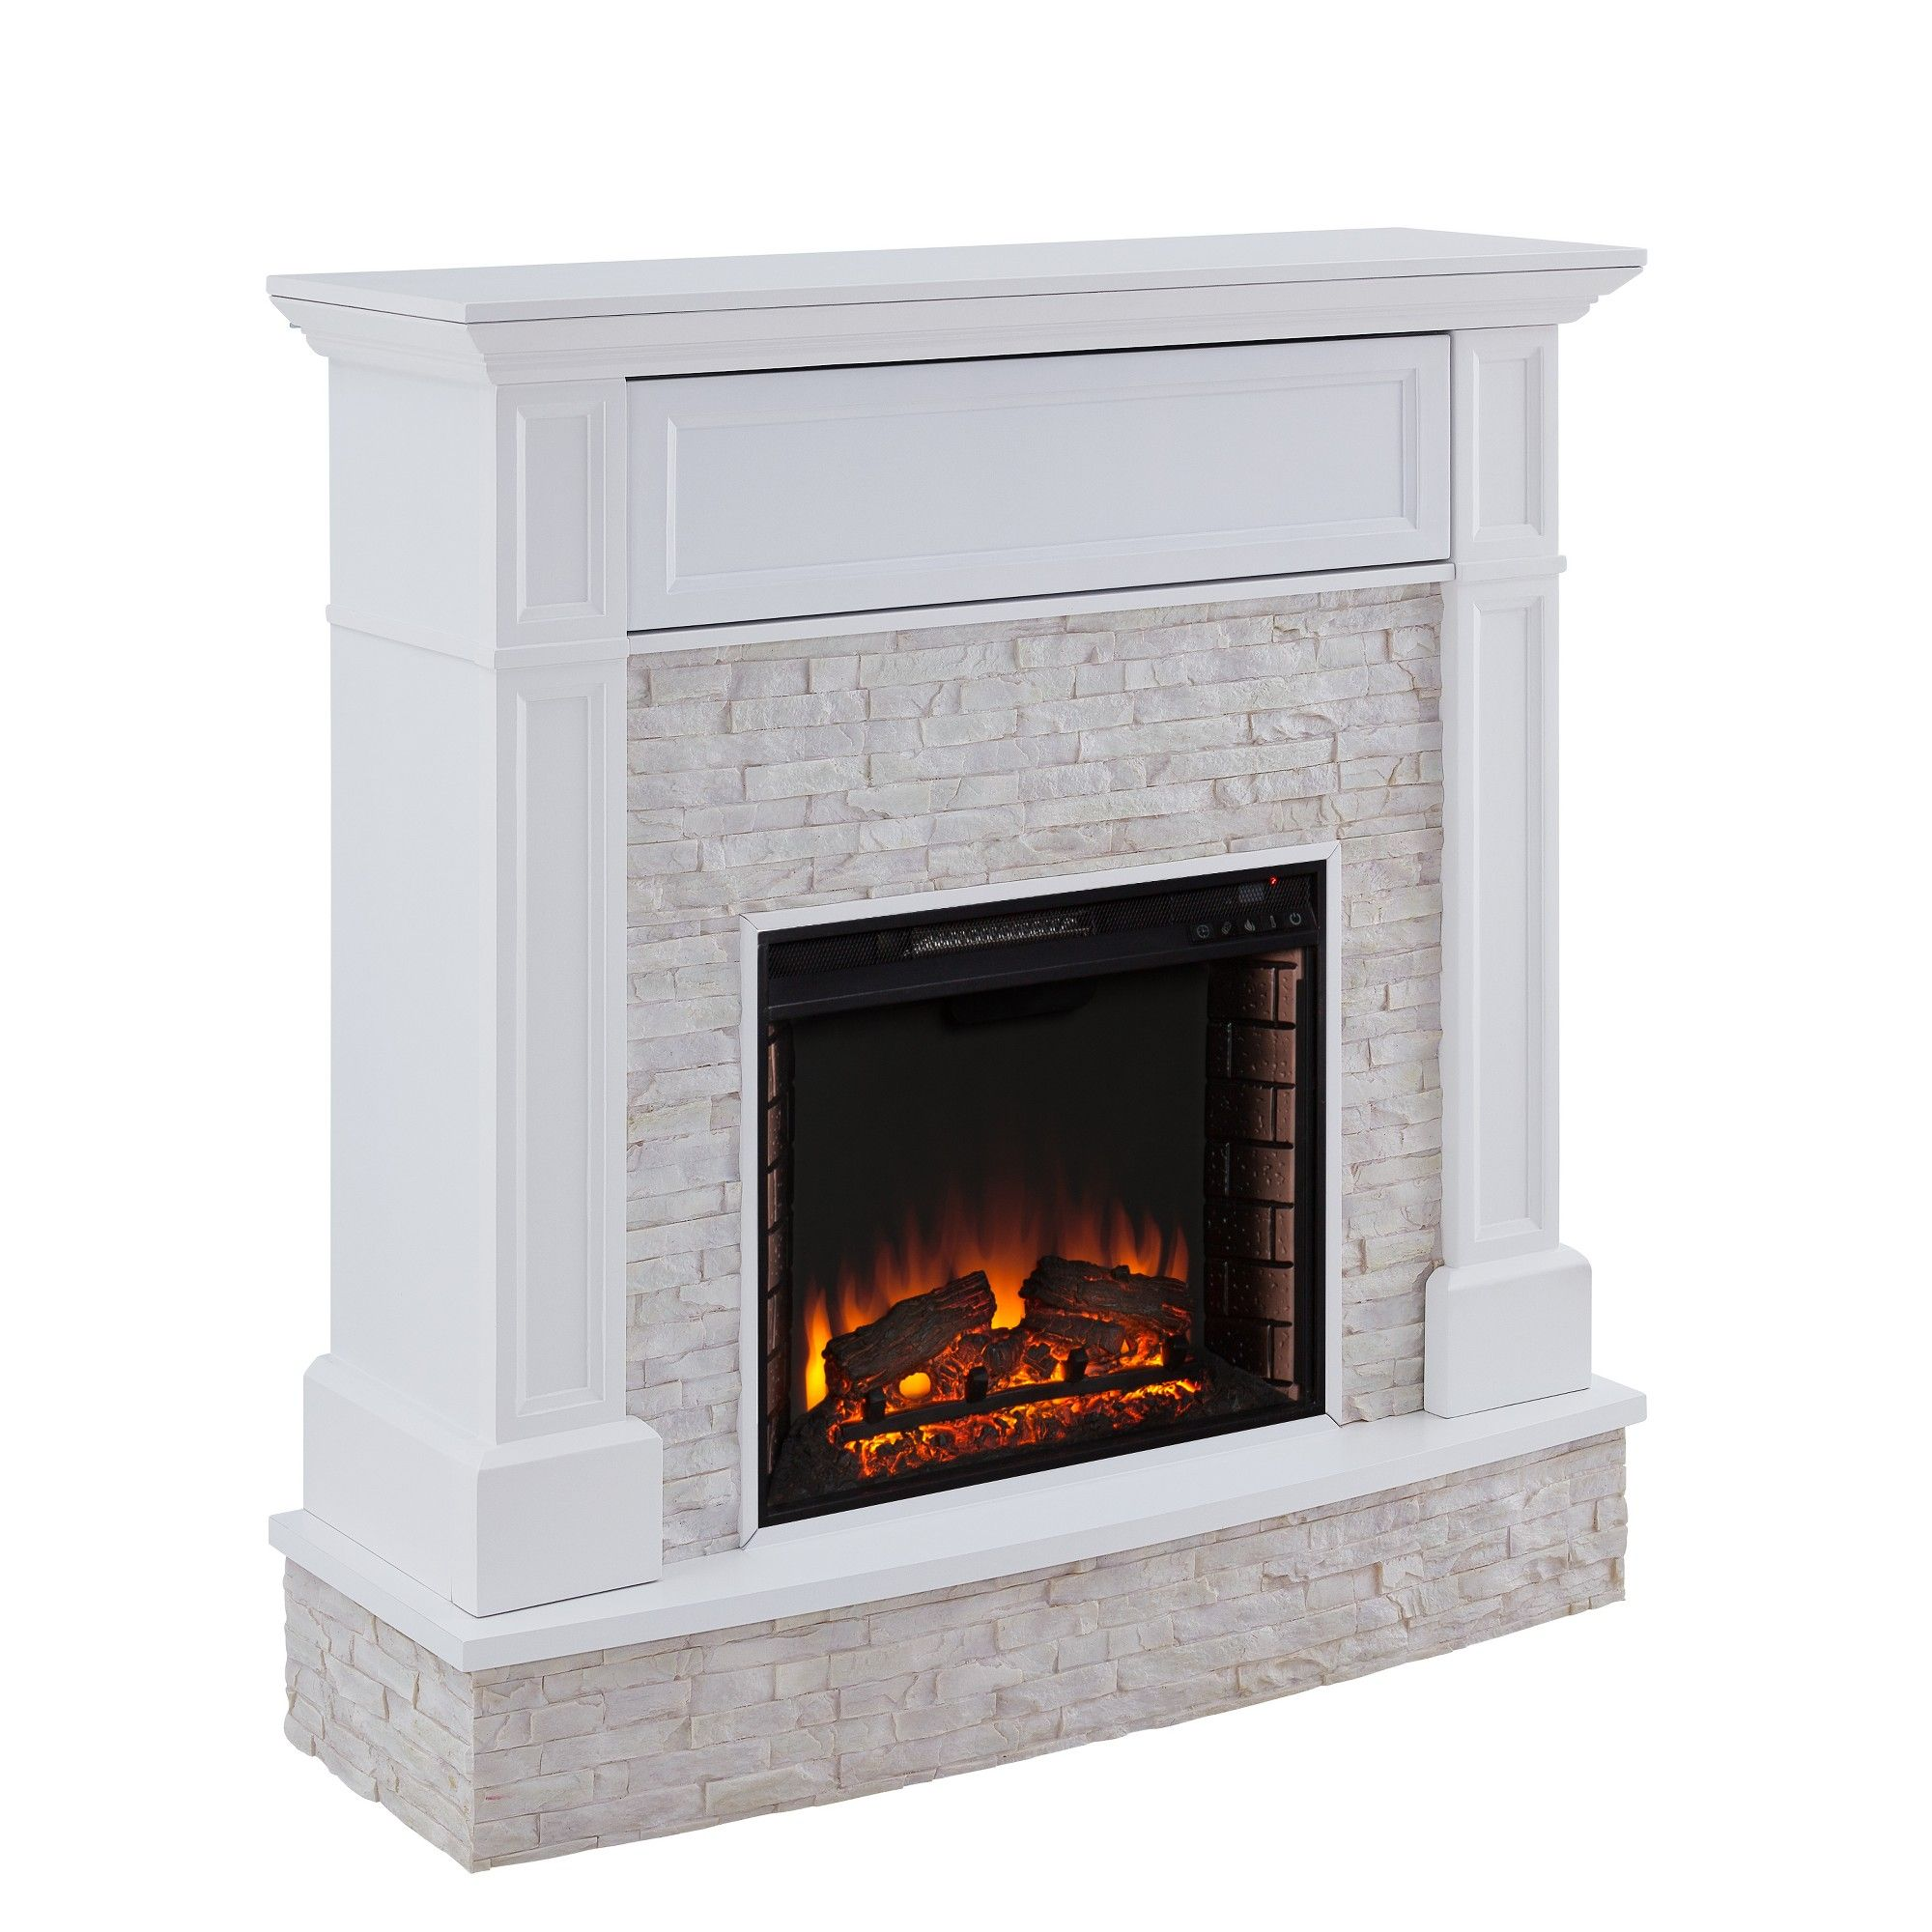 Jerrick Faux Stone Media Fireplace White Aiden Lane Hogar